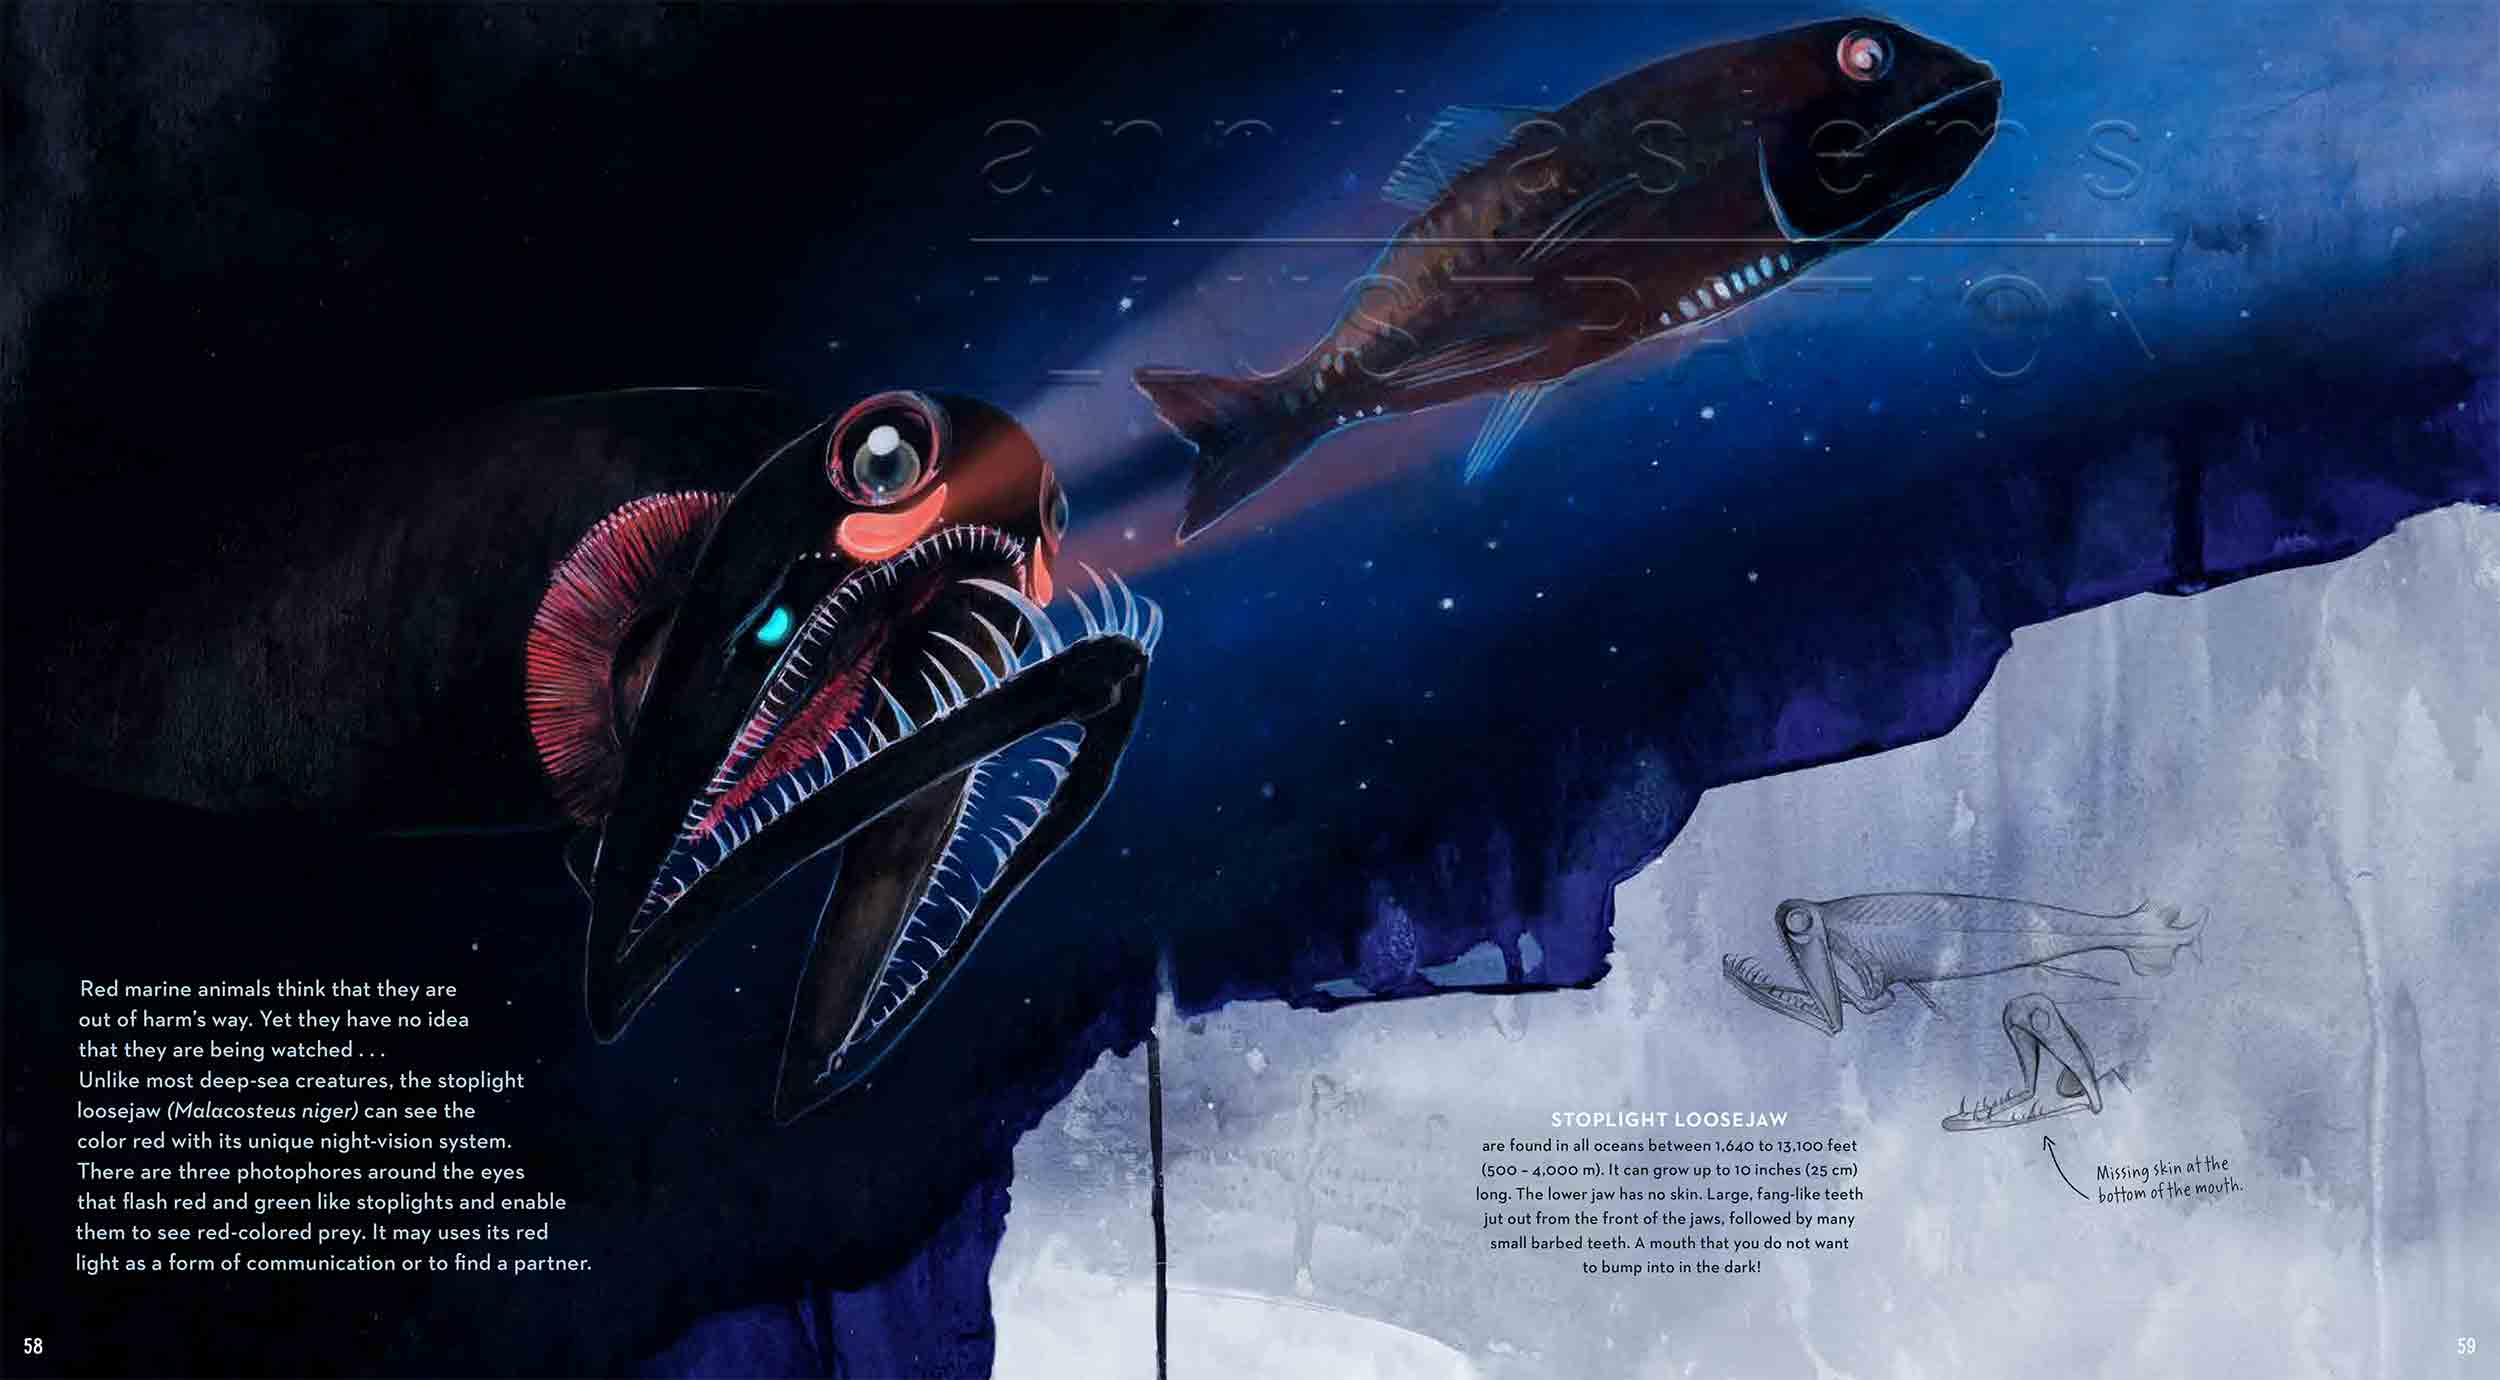 58-59dragonfish-deep-sea-Englisch-submersible-©annikasiems-plankton_deepsea-zooplankton.jpg